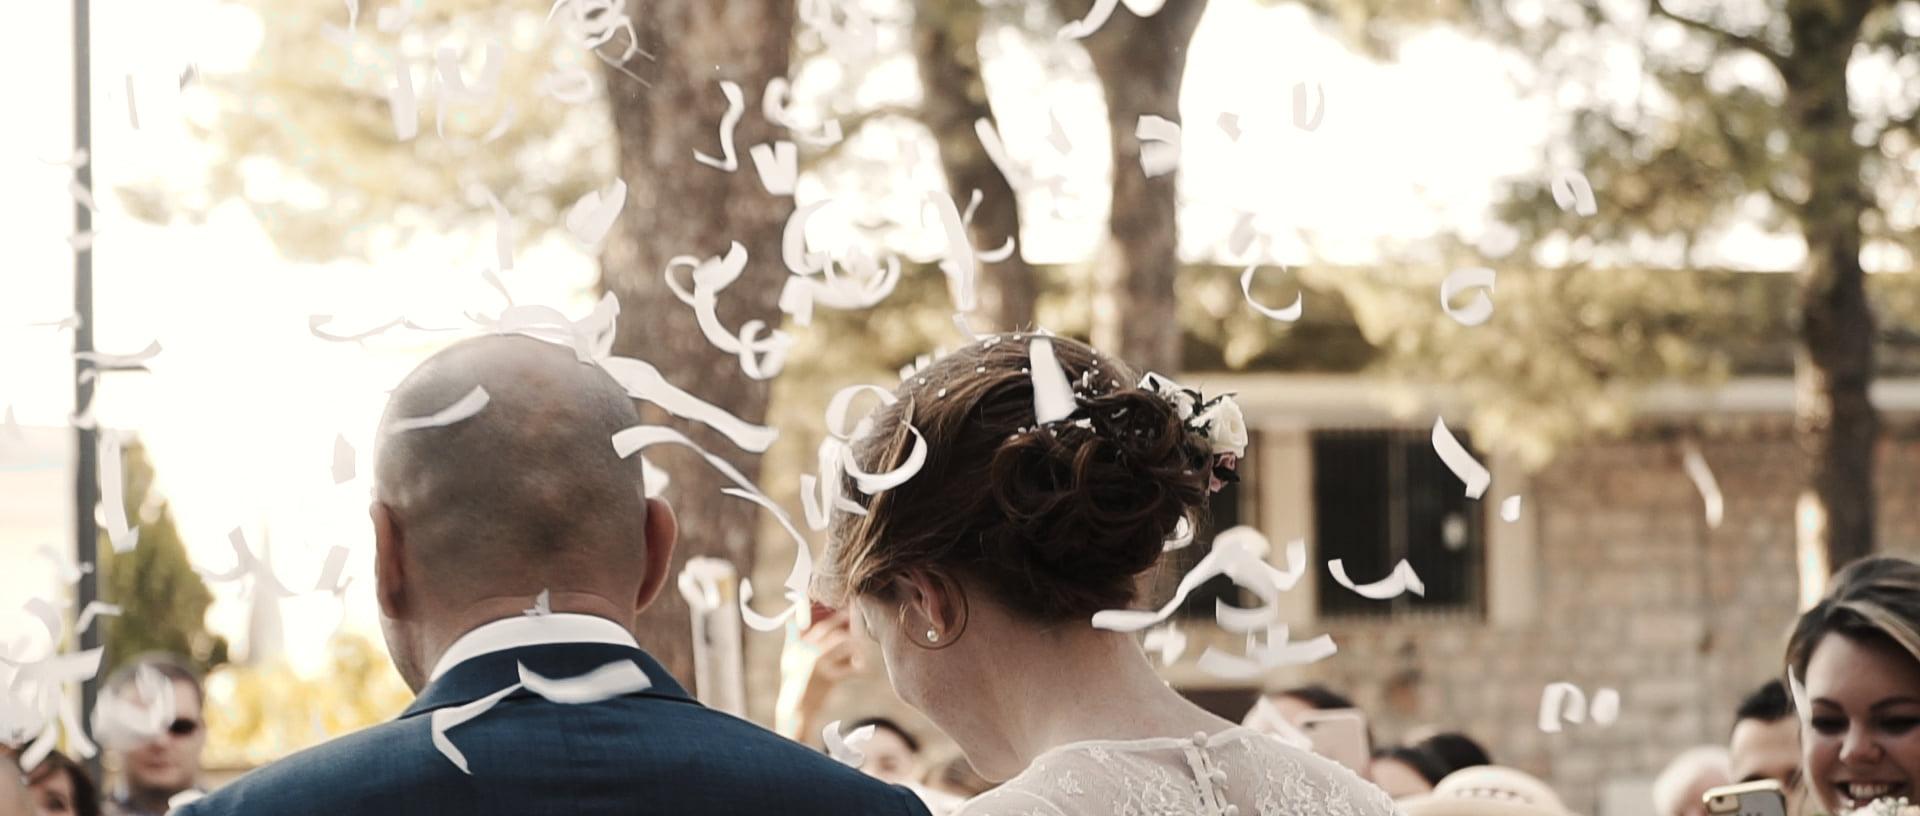 01 best wedding videographer